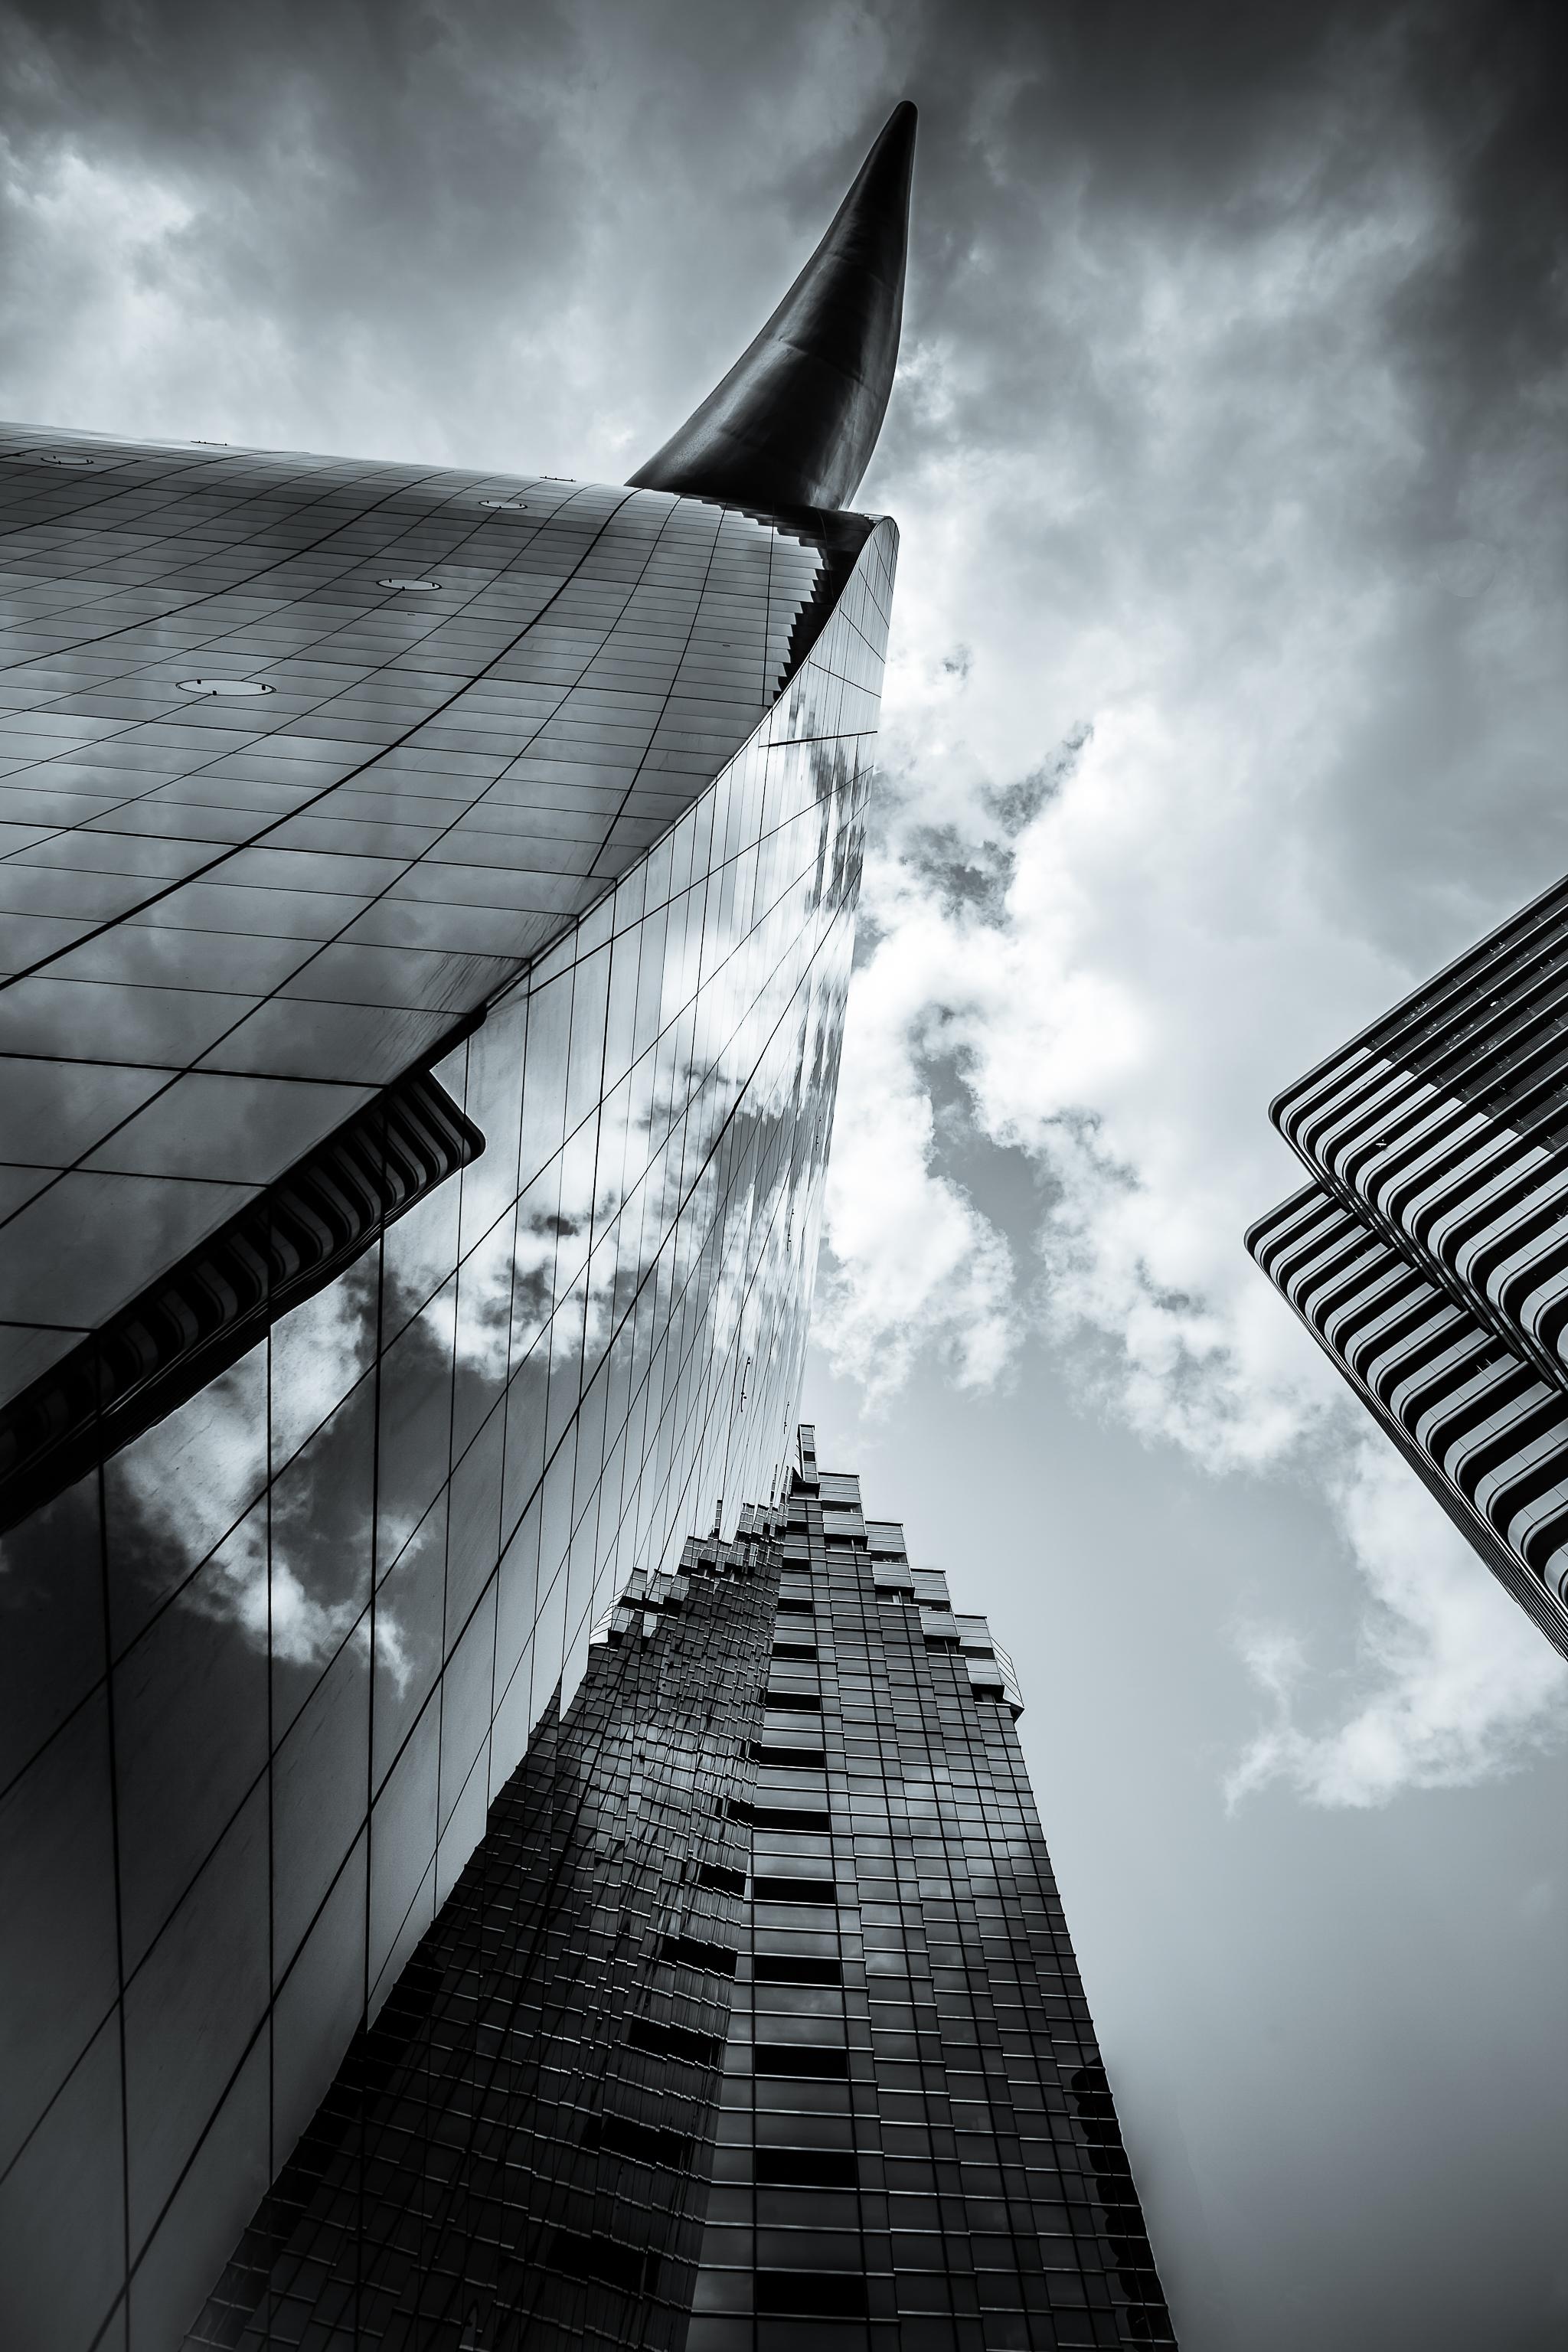 Tatemono vertical city - tokyo japan - La Dent de L'Oeil [OC][2048x1378]